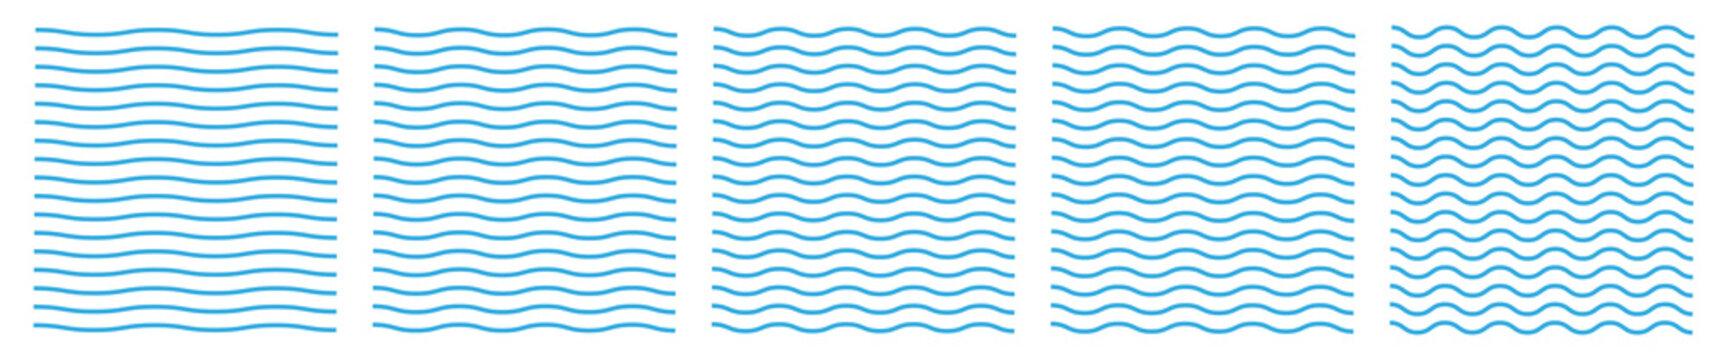 Set of wavy zigzag lines. Wave thin line background. Vector zigzag and wavy blue horizontal underline. Vector illustration EPS10.